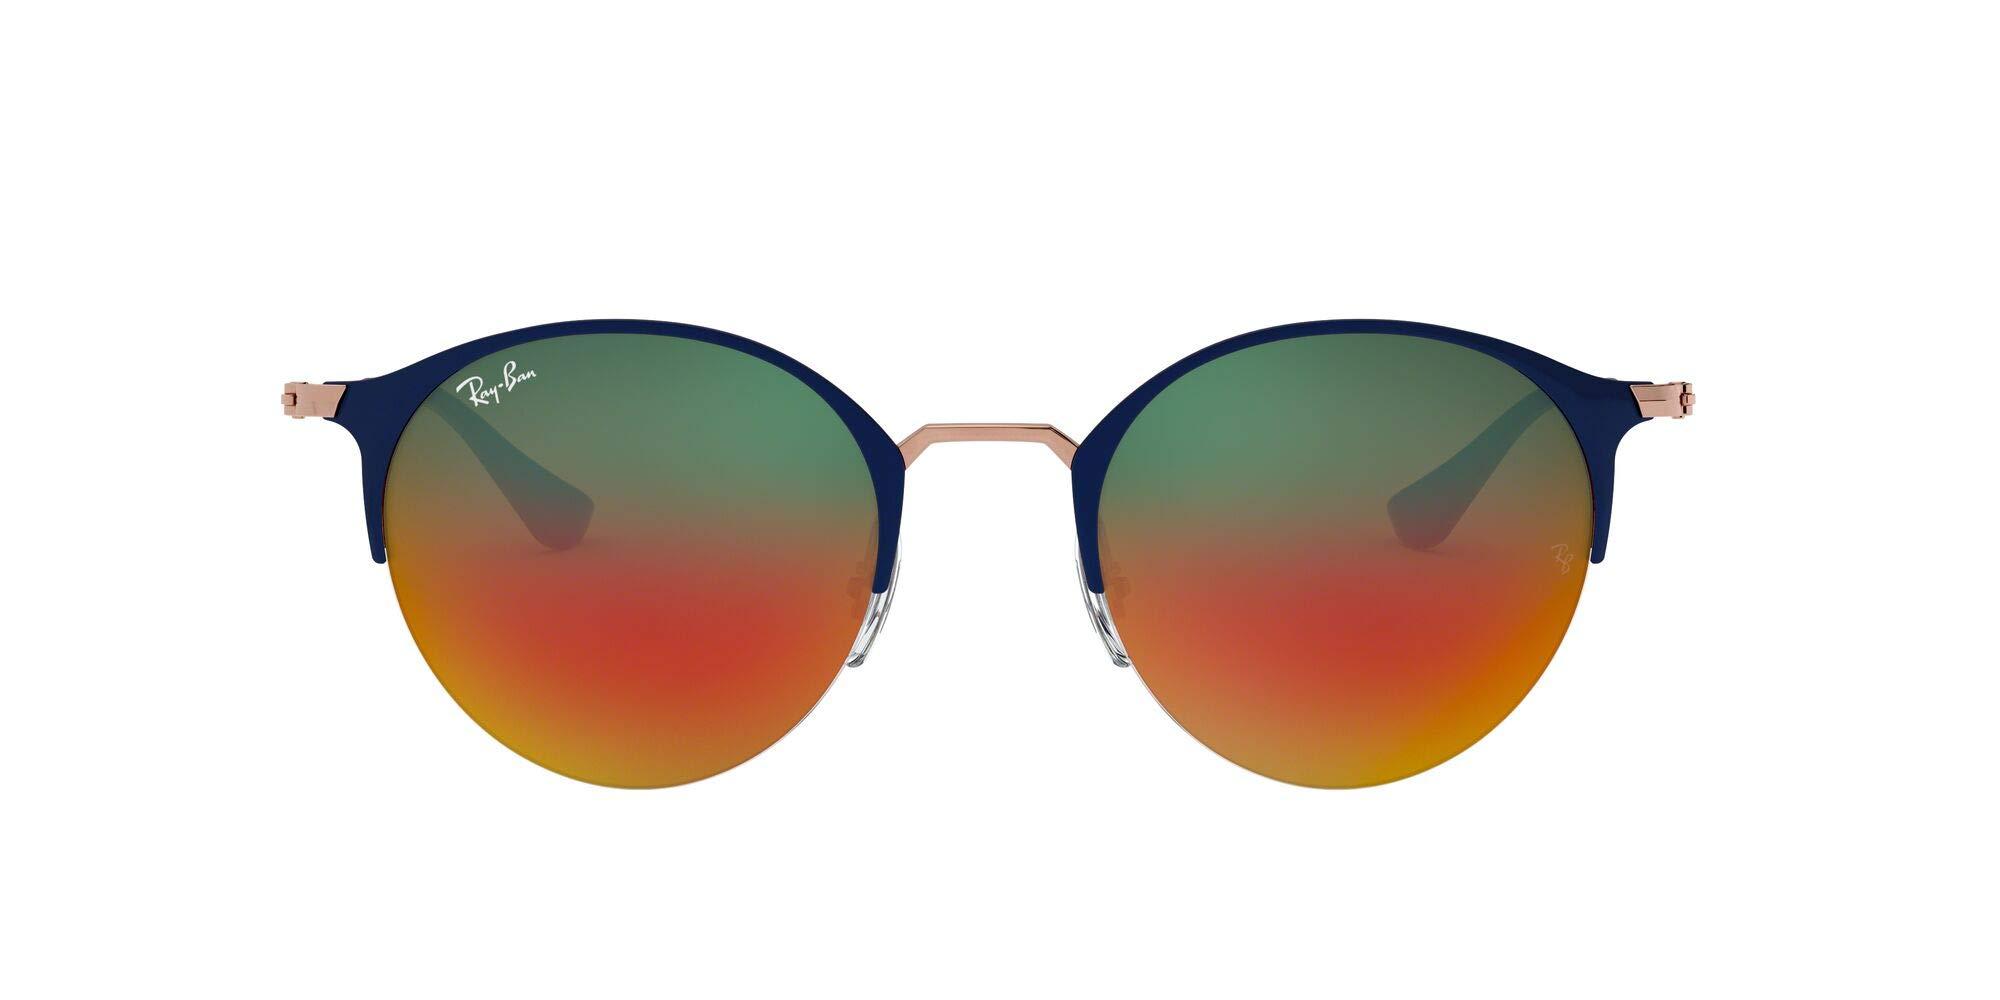 Ray-Ban Rb3578 Round Metal Sunglasses